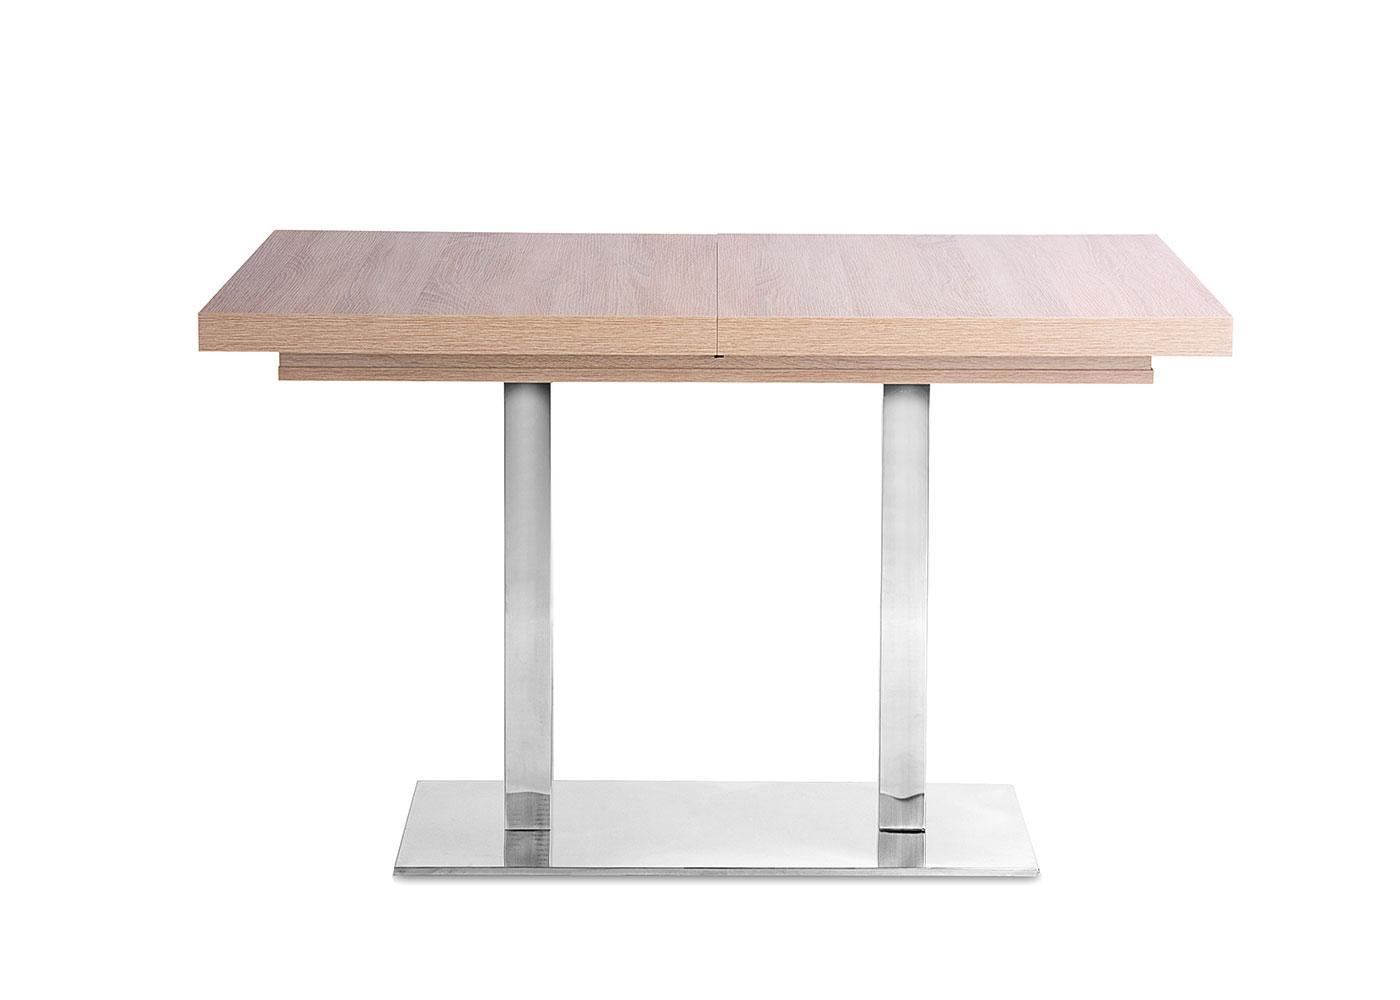 Jedálny stôl rozkladací August, 200 cm, dub, dub